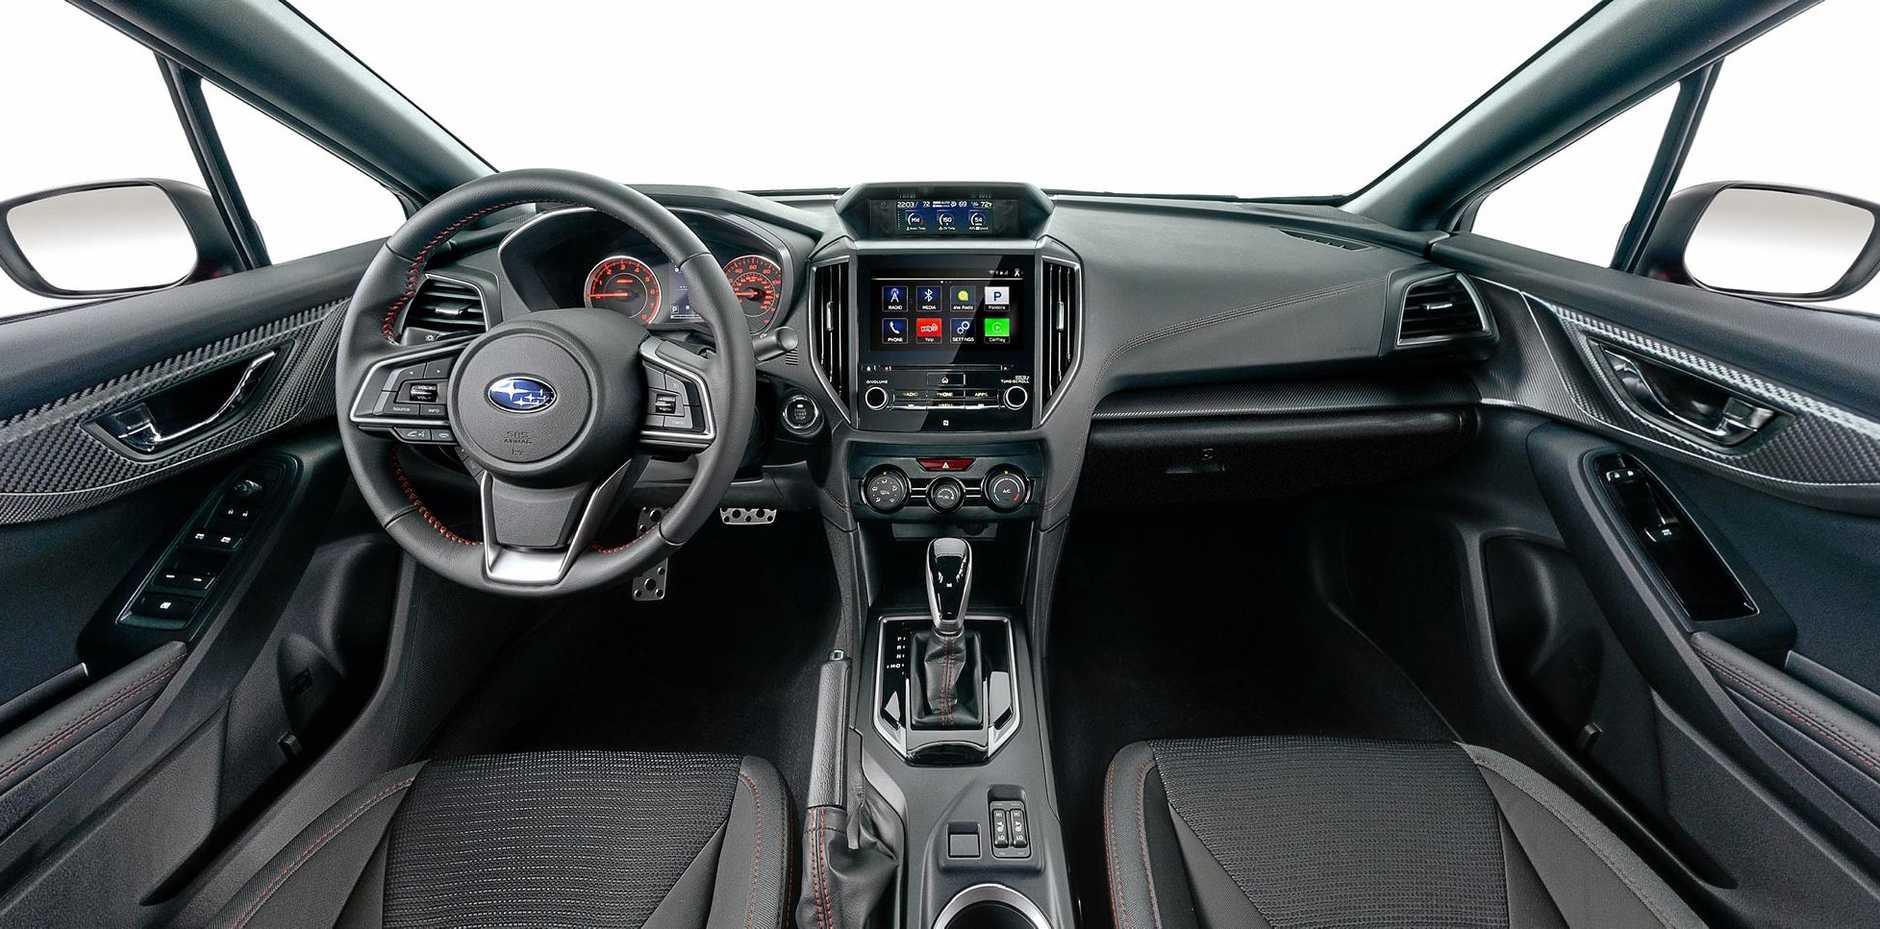 Inside the 2017 Subaru Impreza.